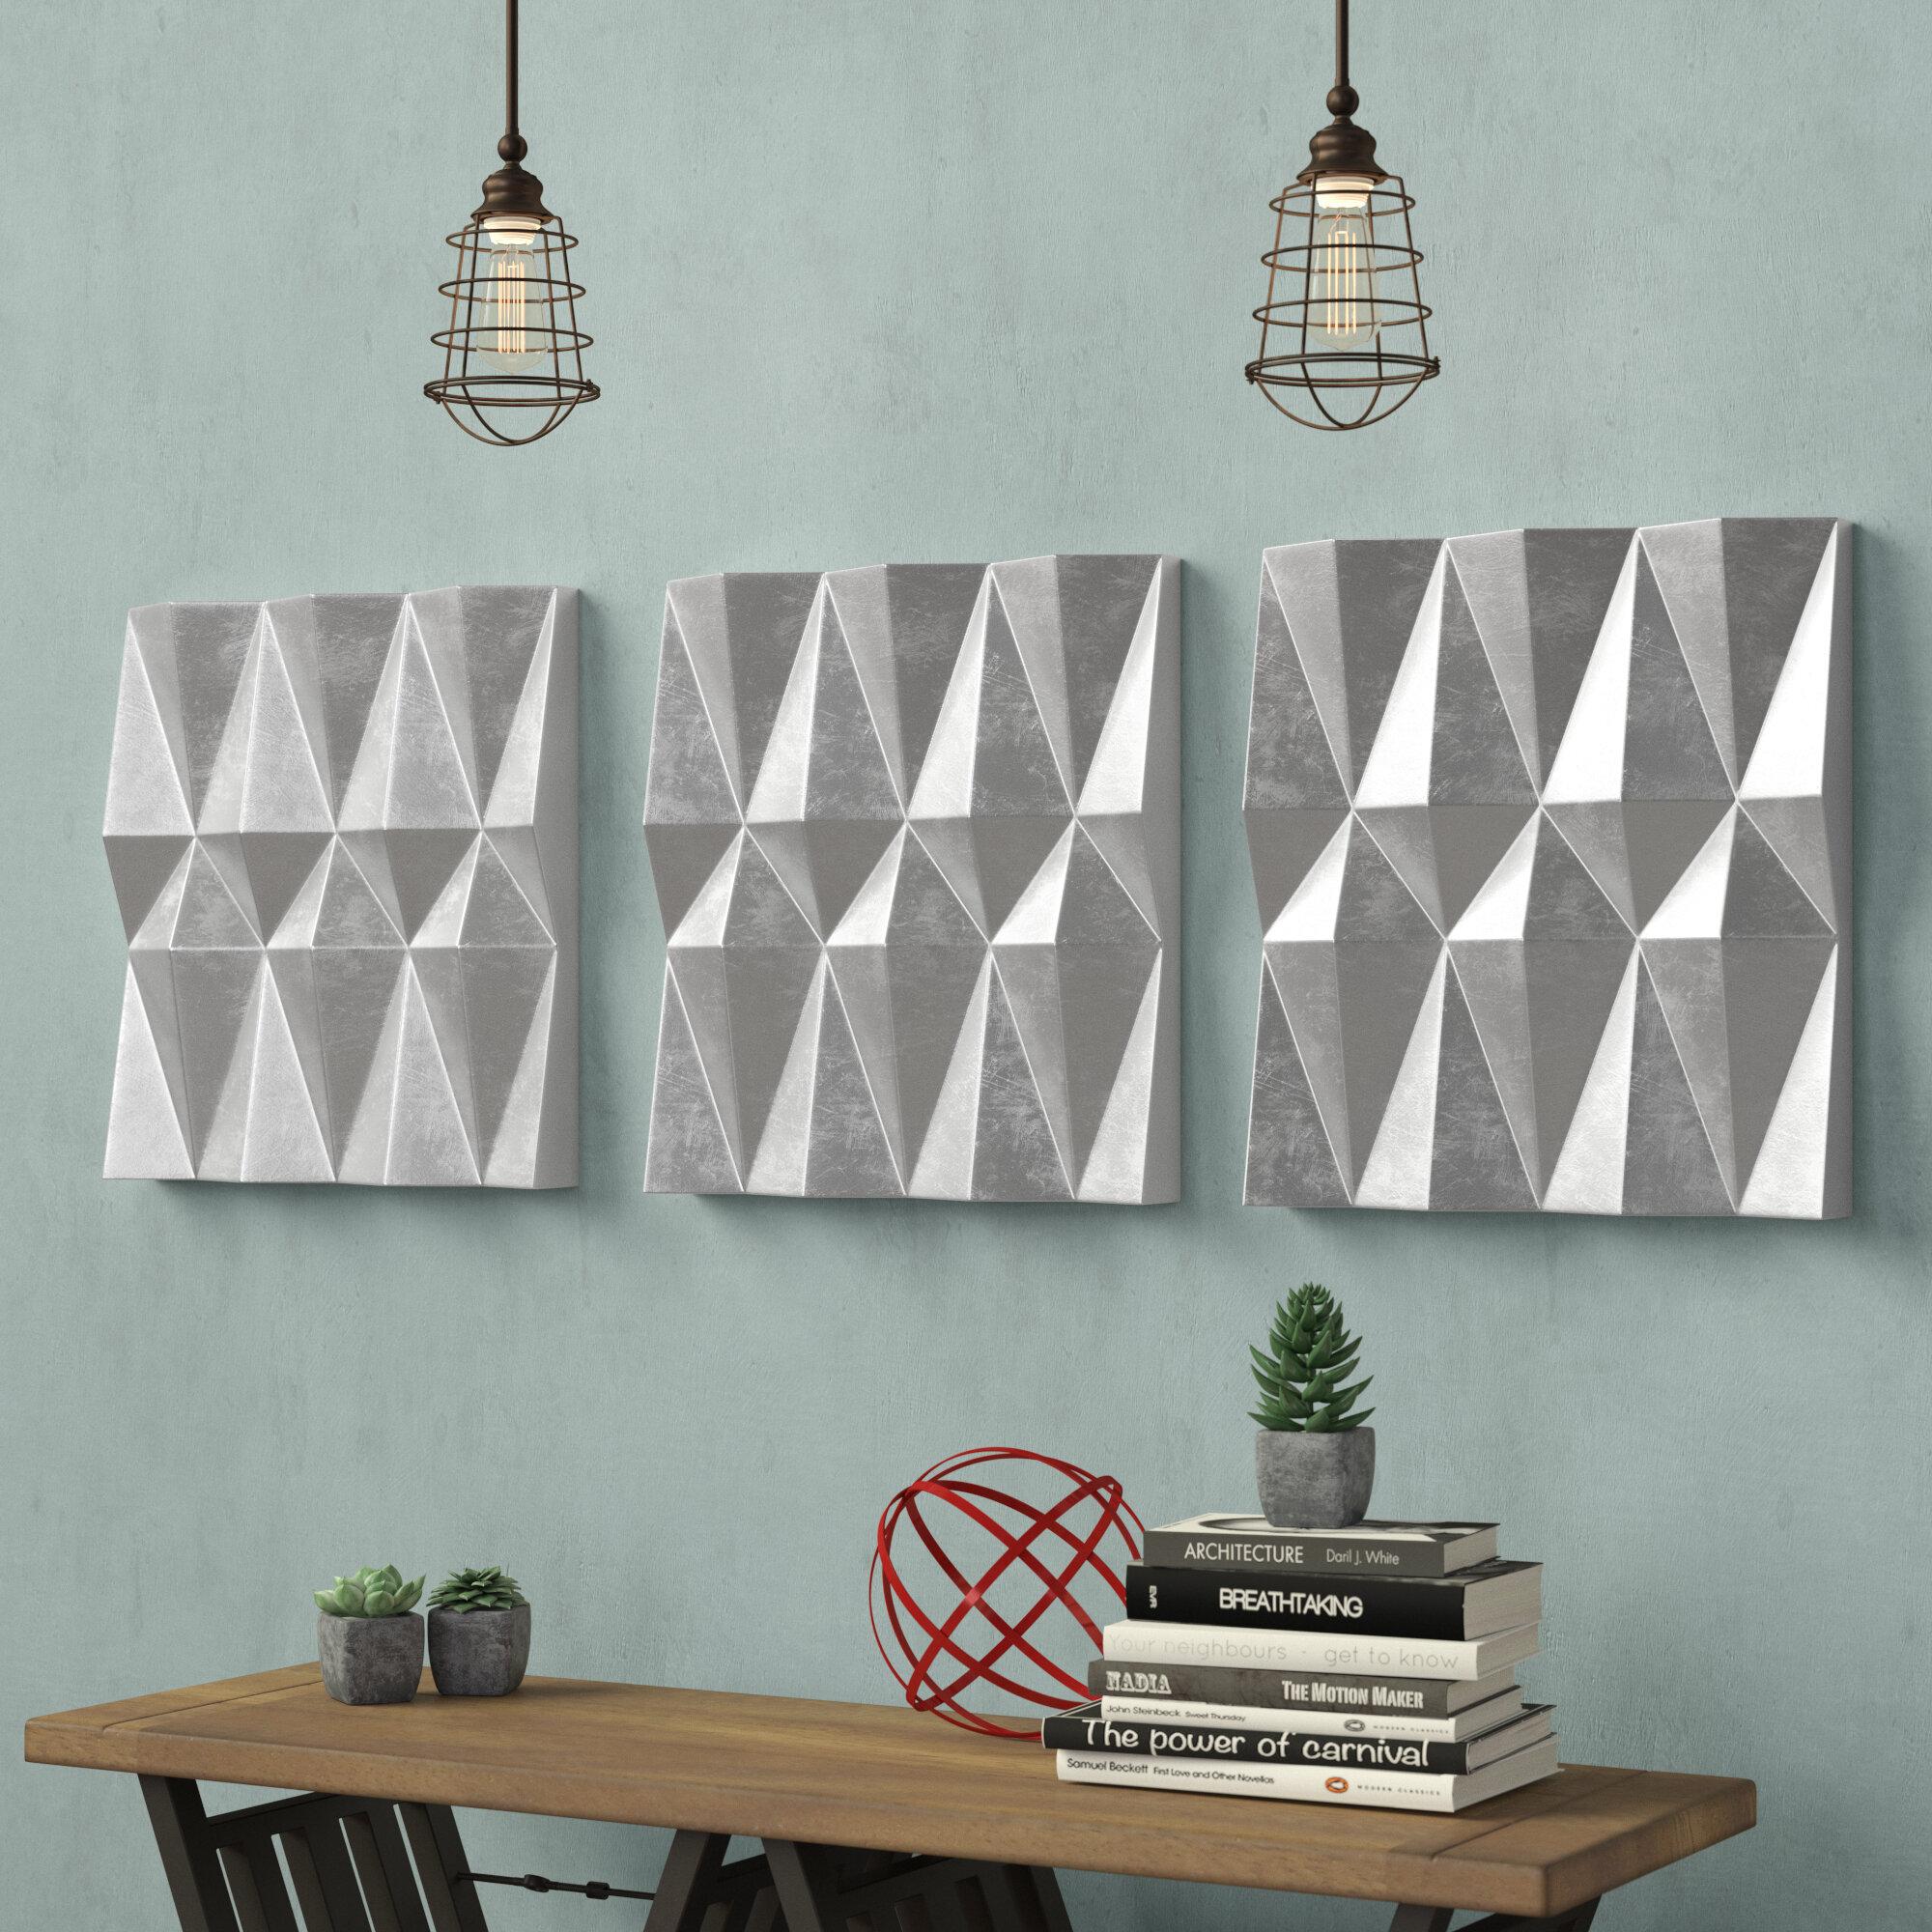 17 Stories Silver Metal Wall Decor Reviews Wayfair